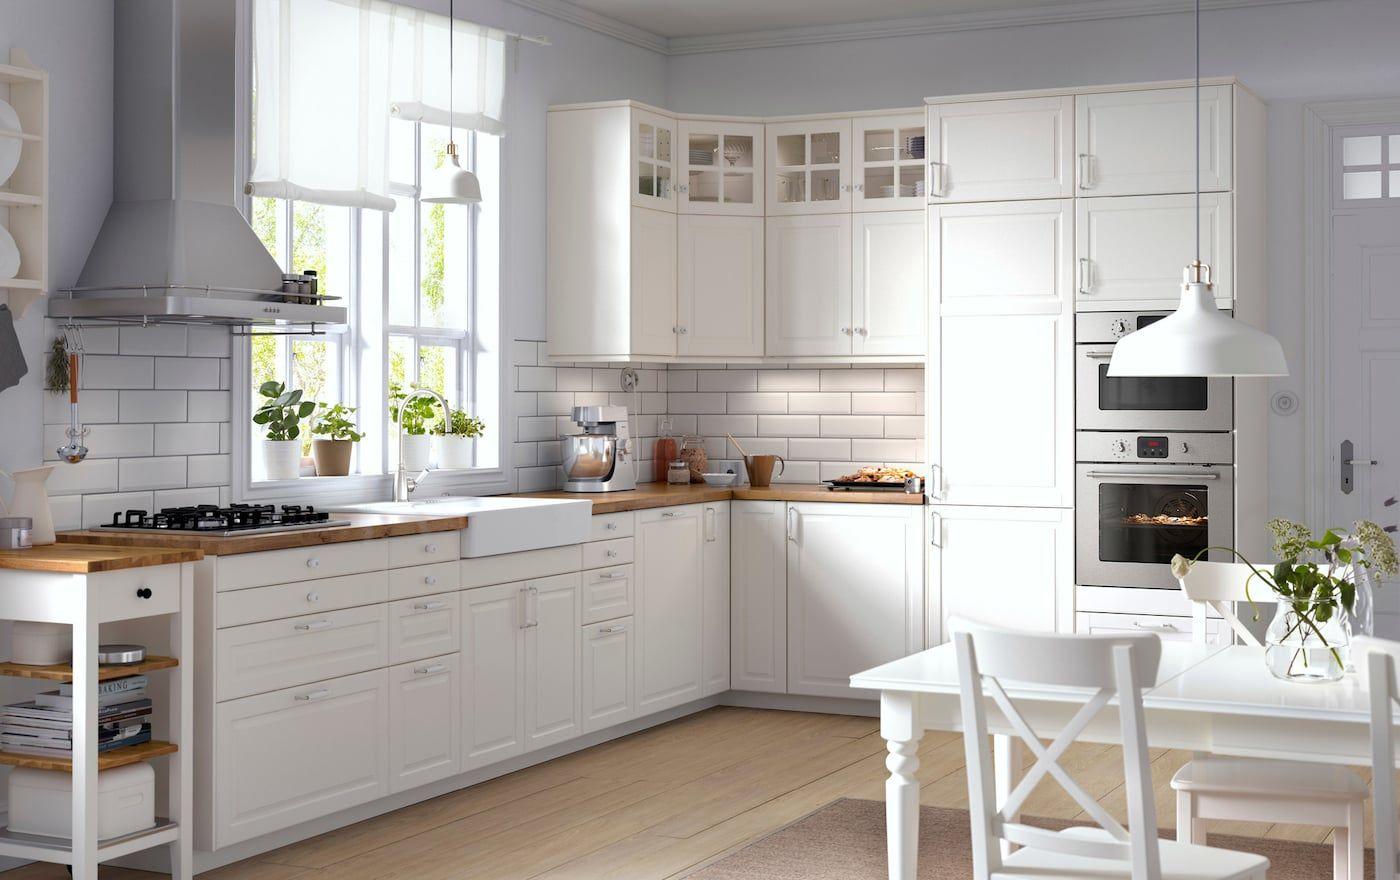 Ante Cucina In Vetro.Lasciati Ispirare Dalle Nostre Cucine Ikea Kitchen Design Ikea